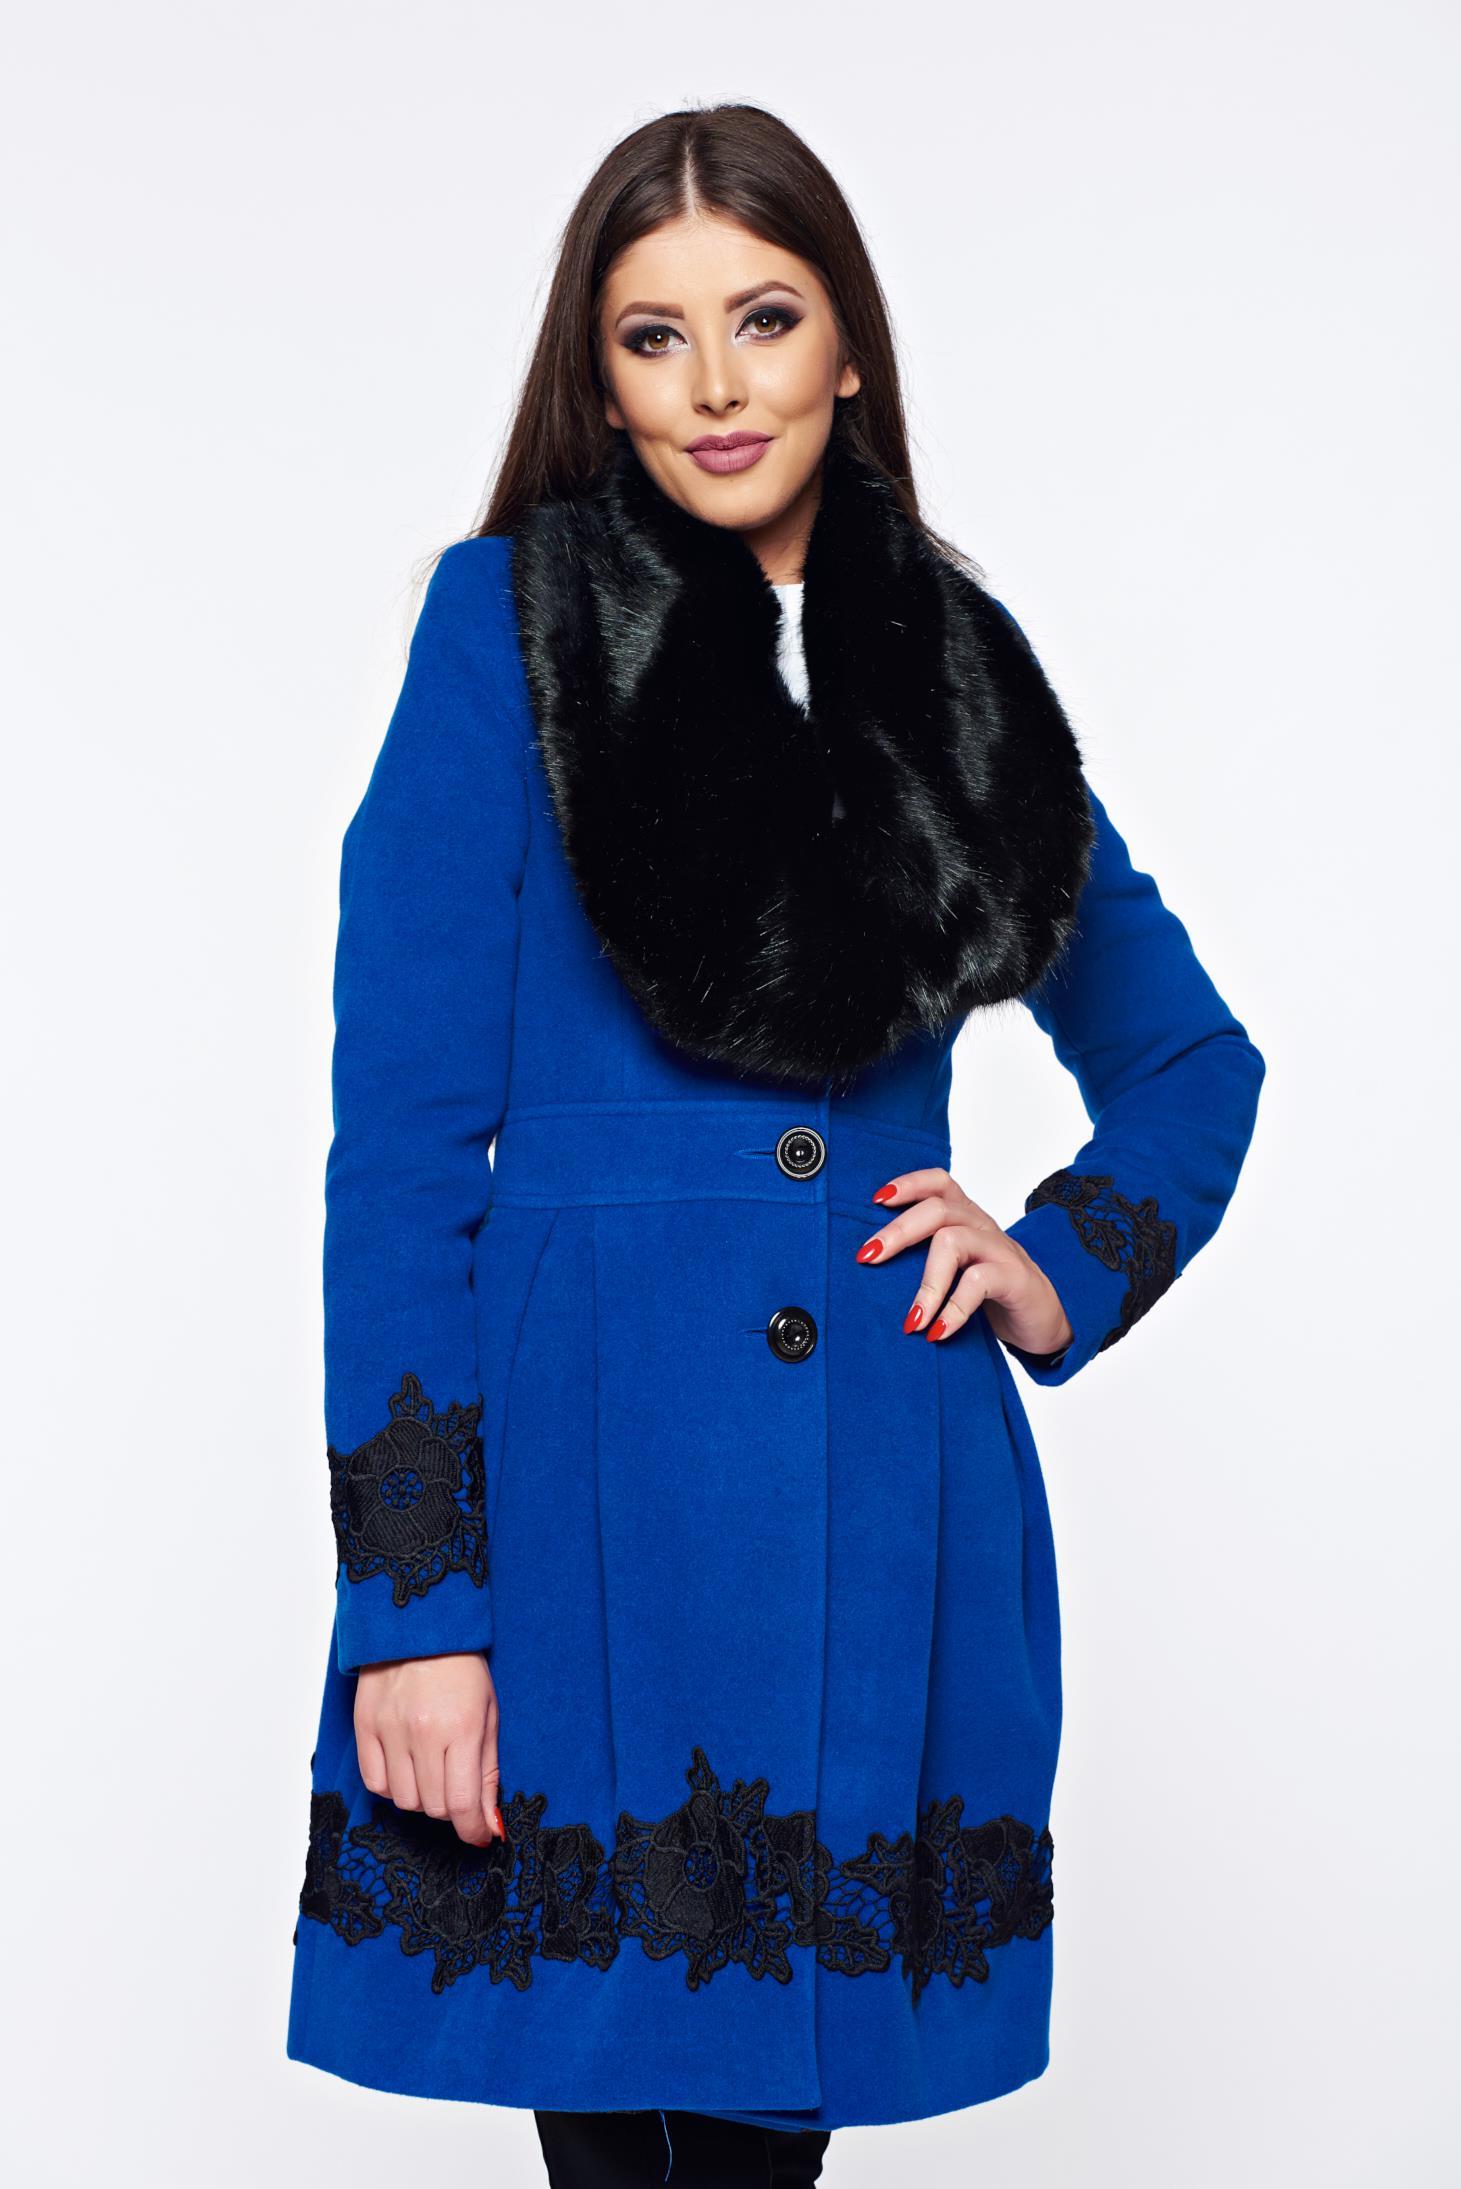 Palton LaDonna albastru elegant in clos cu insertii de broderie